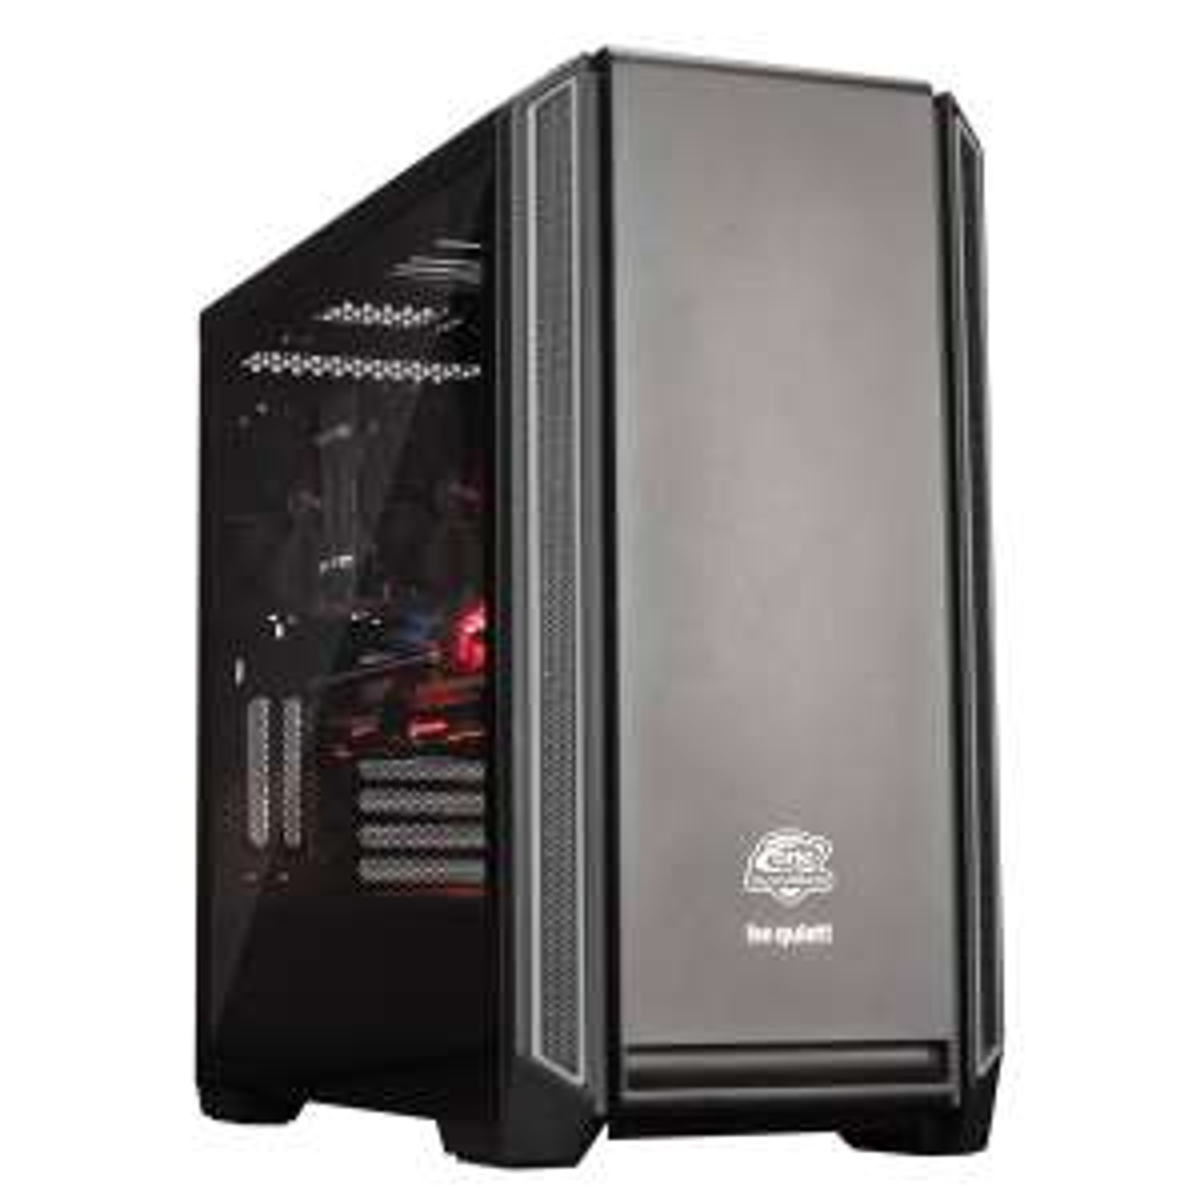 Gaming PC [konfigurierbar] Ryzen 5600X, MSI Ventus RTX 3080 10GB, 32GB DDR4-3200, B550 Wifi ,1TB NVMe SSD, 850W BeQuiet Platinum NT